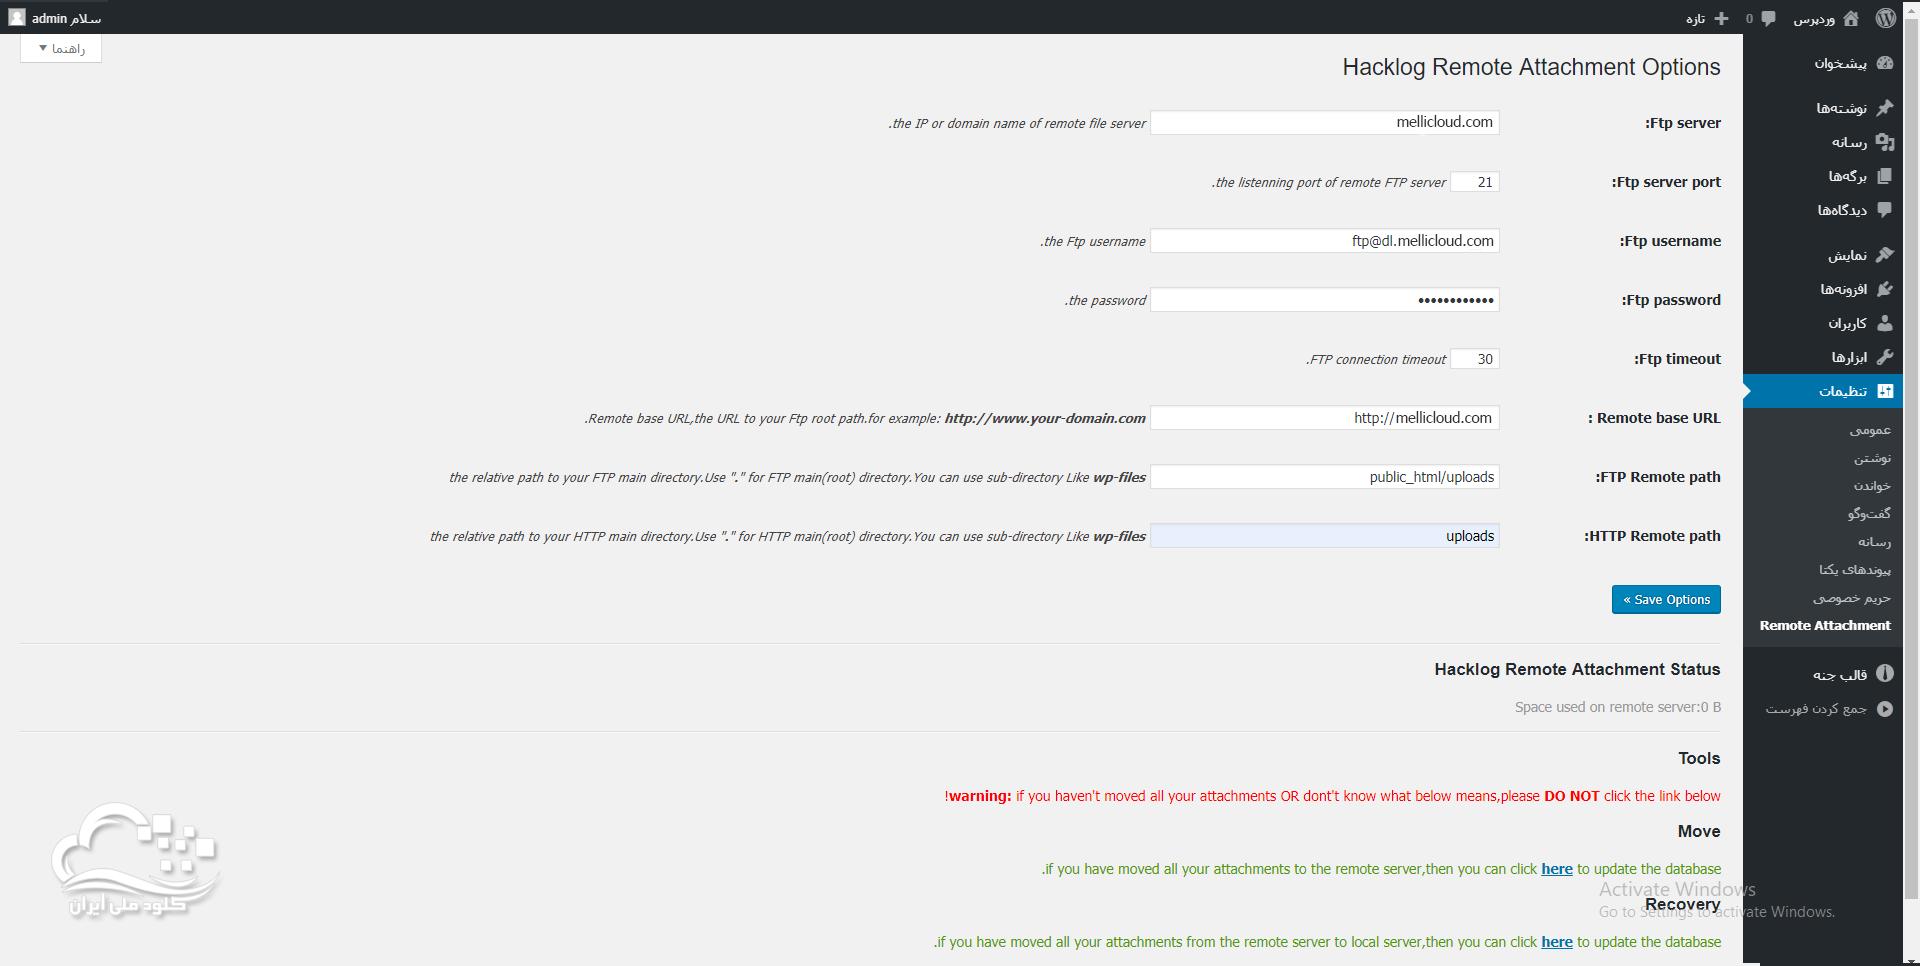 Hacklog-Remote-Attachement-ftp